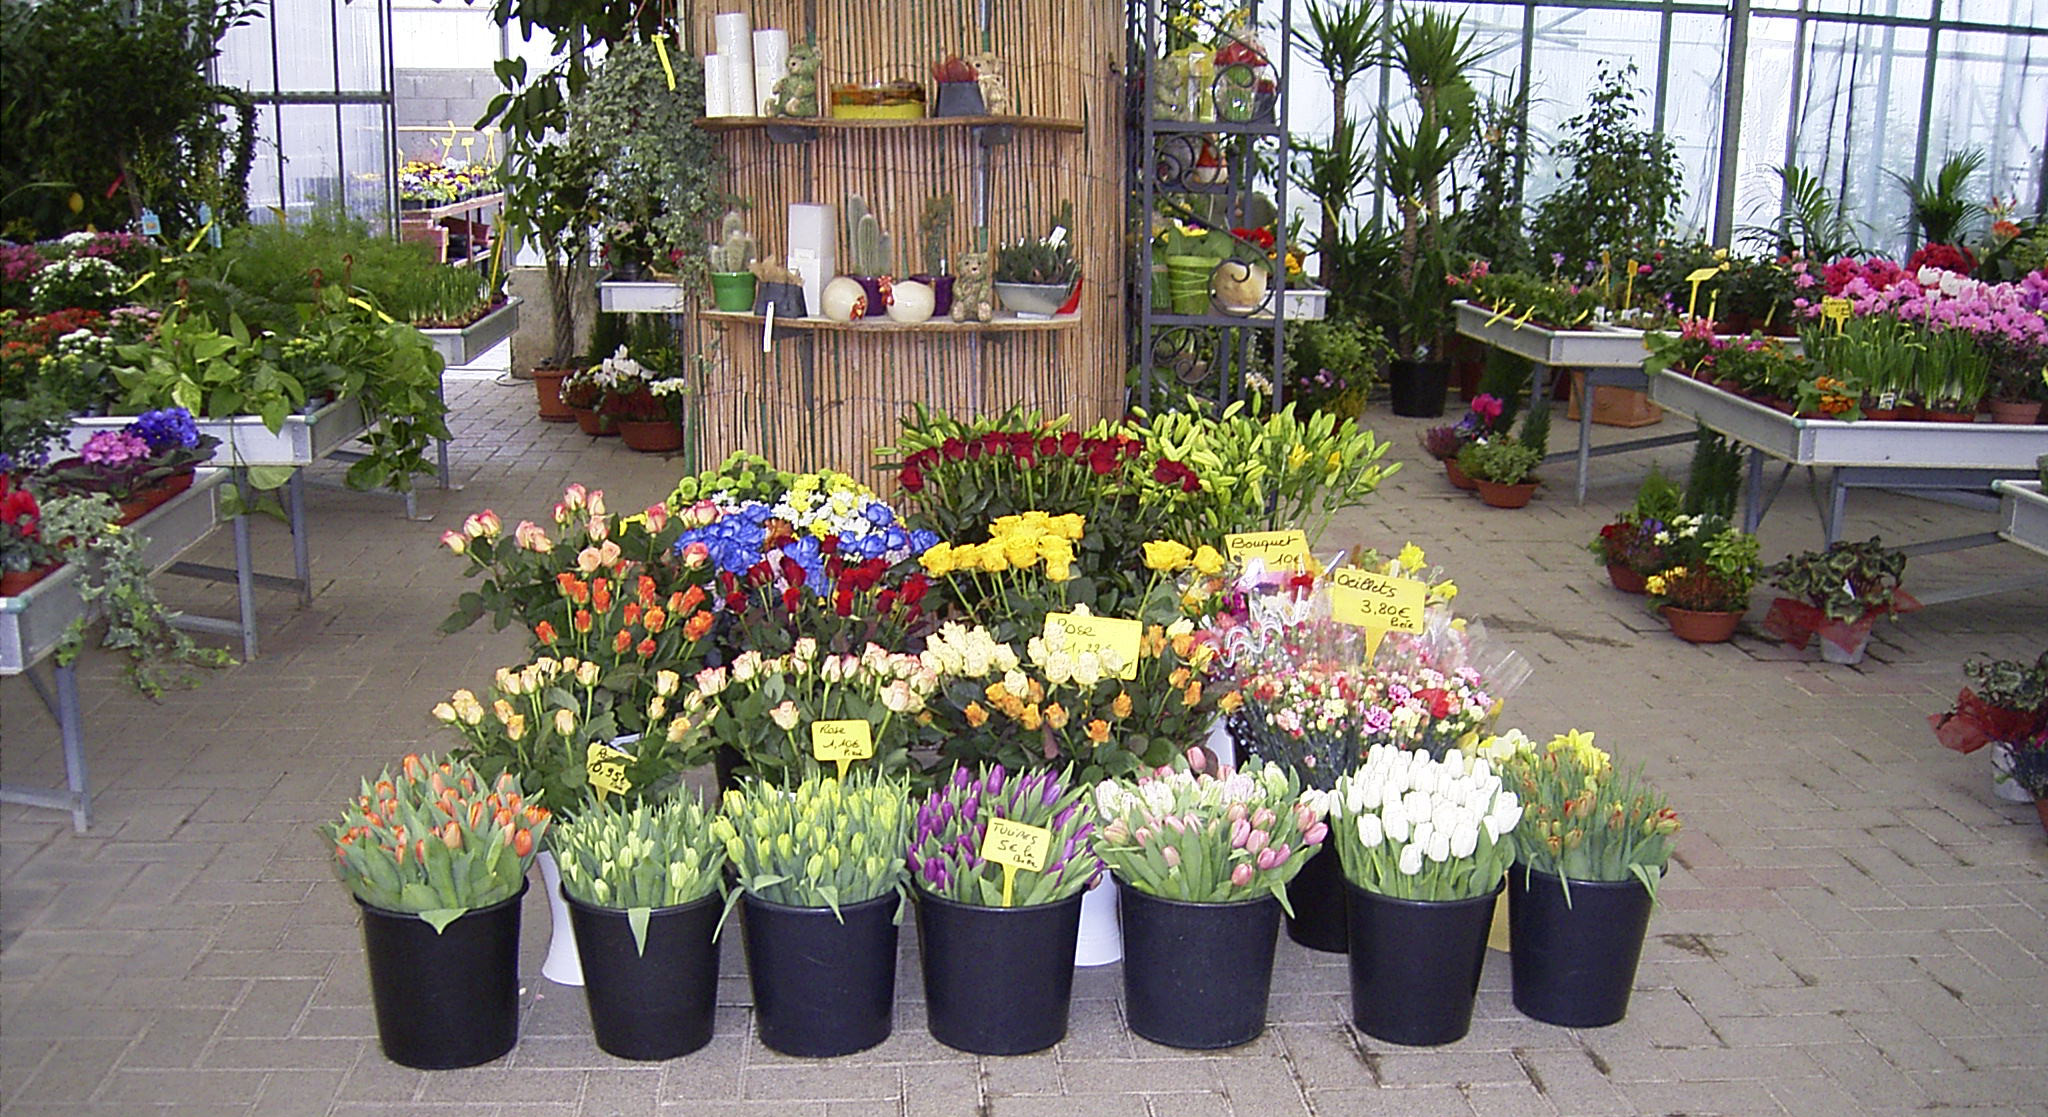 La serre, espace fleuriste